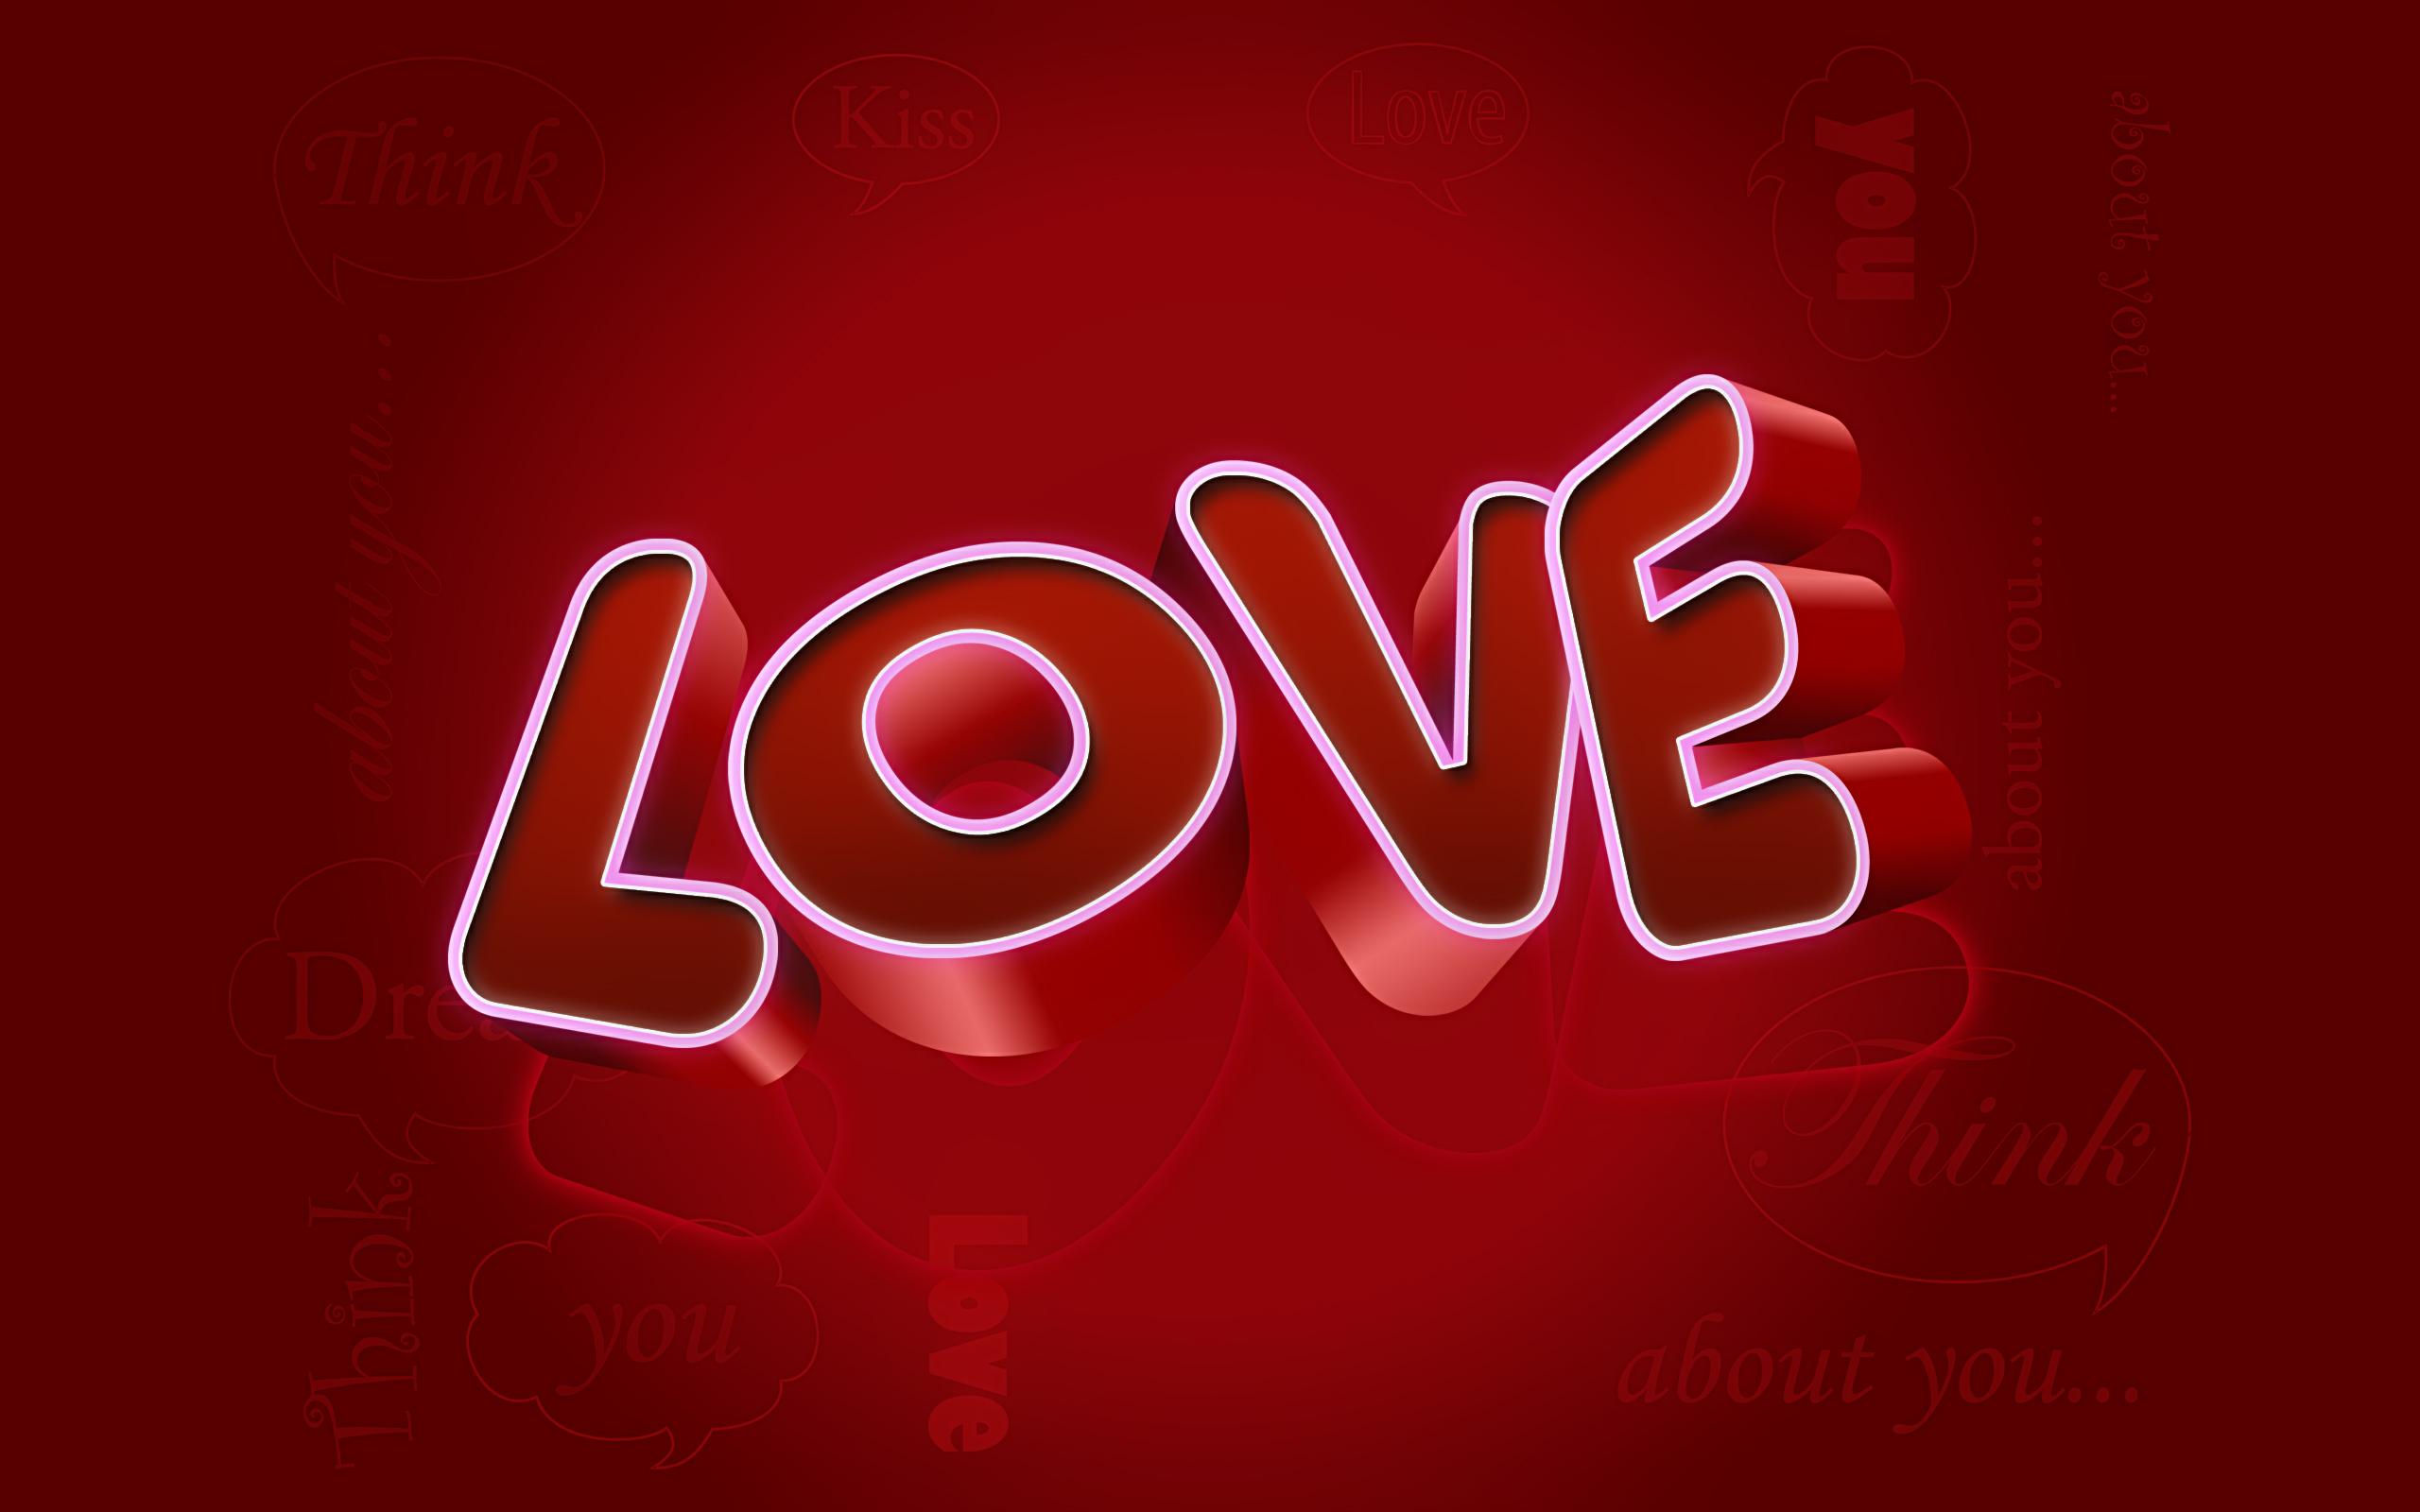 3D Love Images 2 Cool Hd Wallpaper